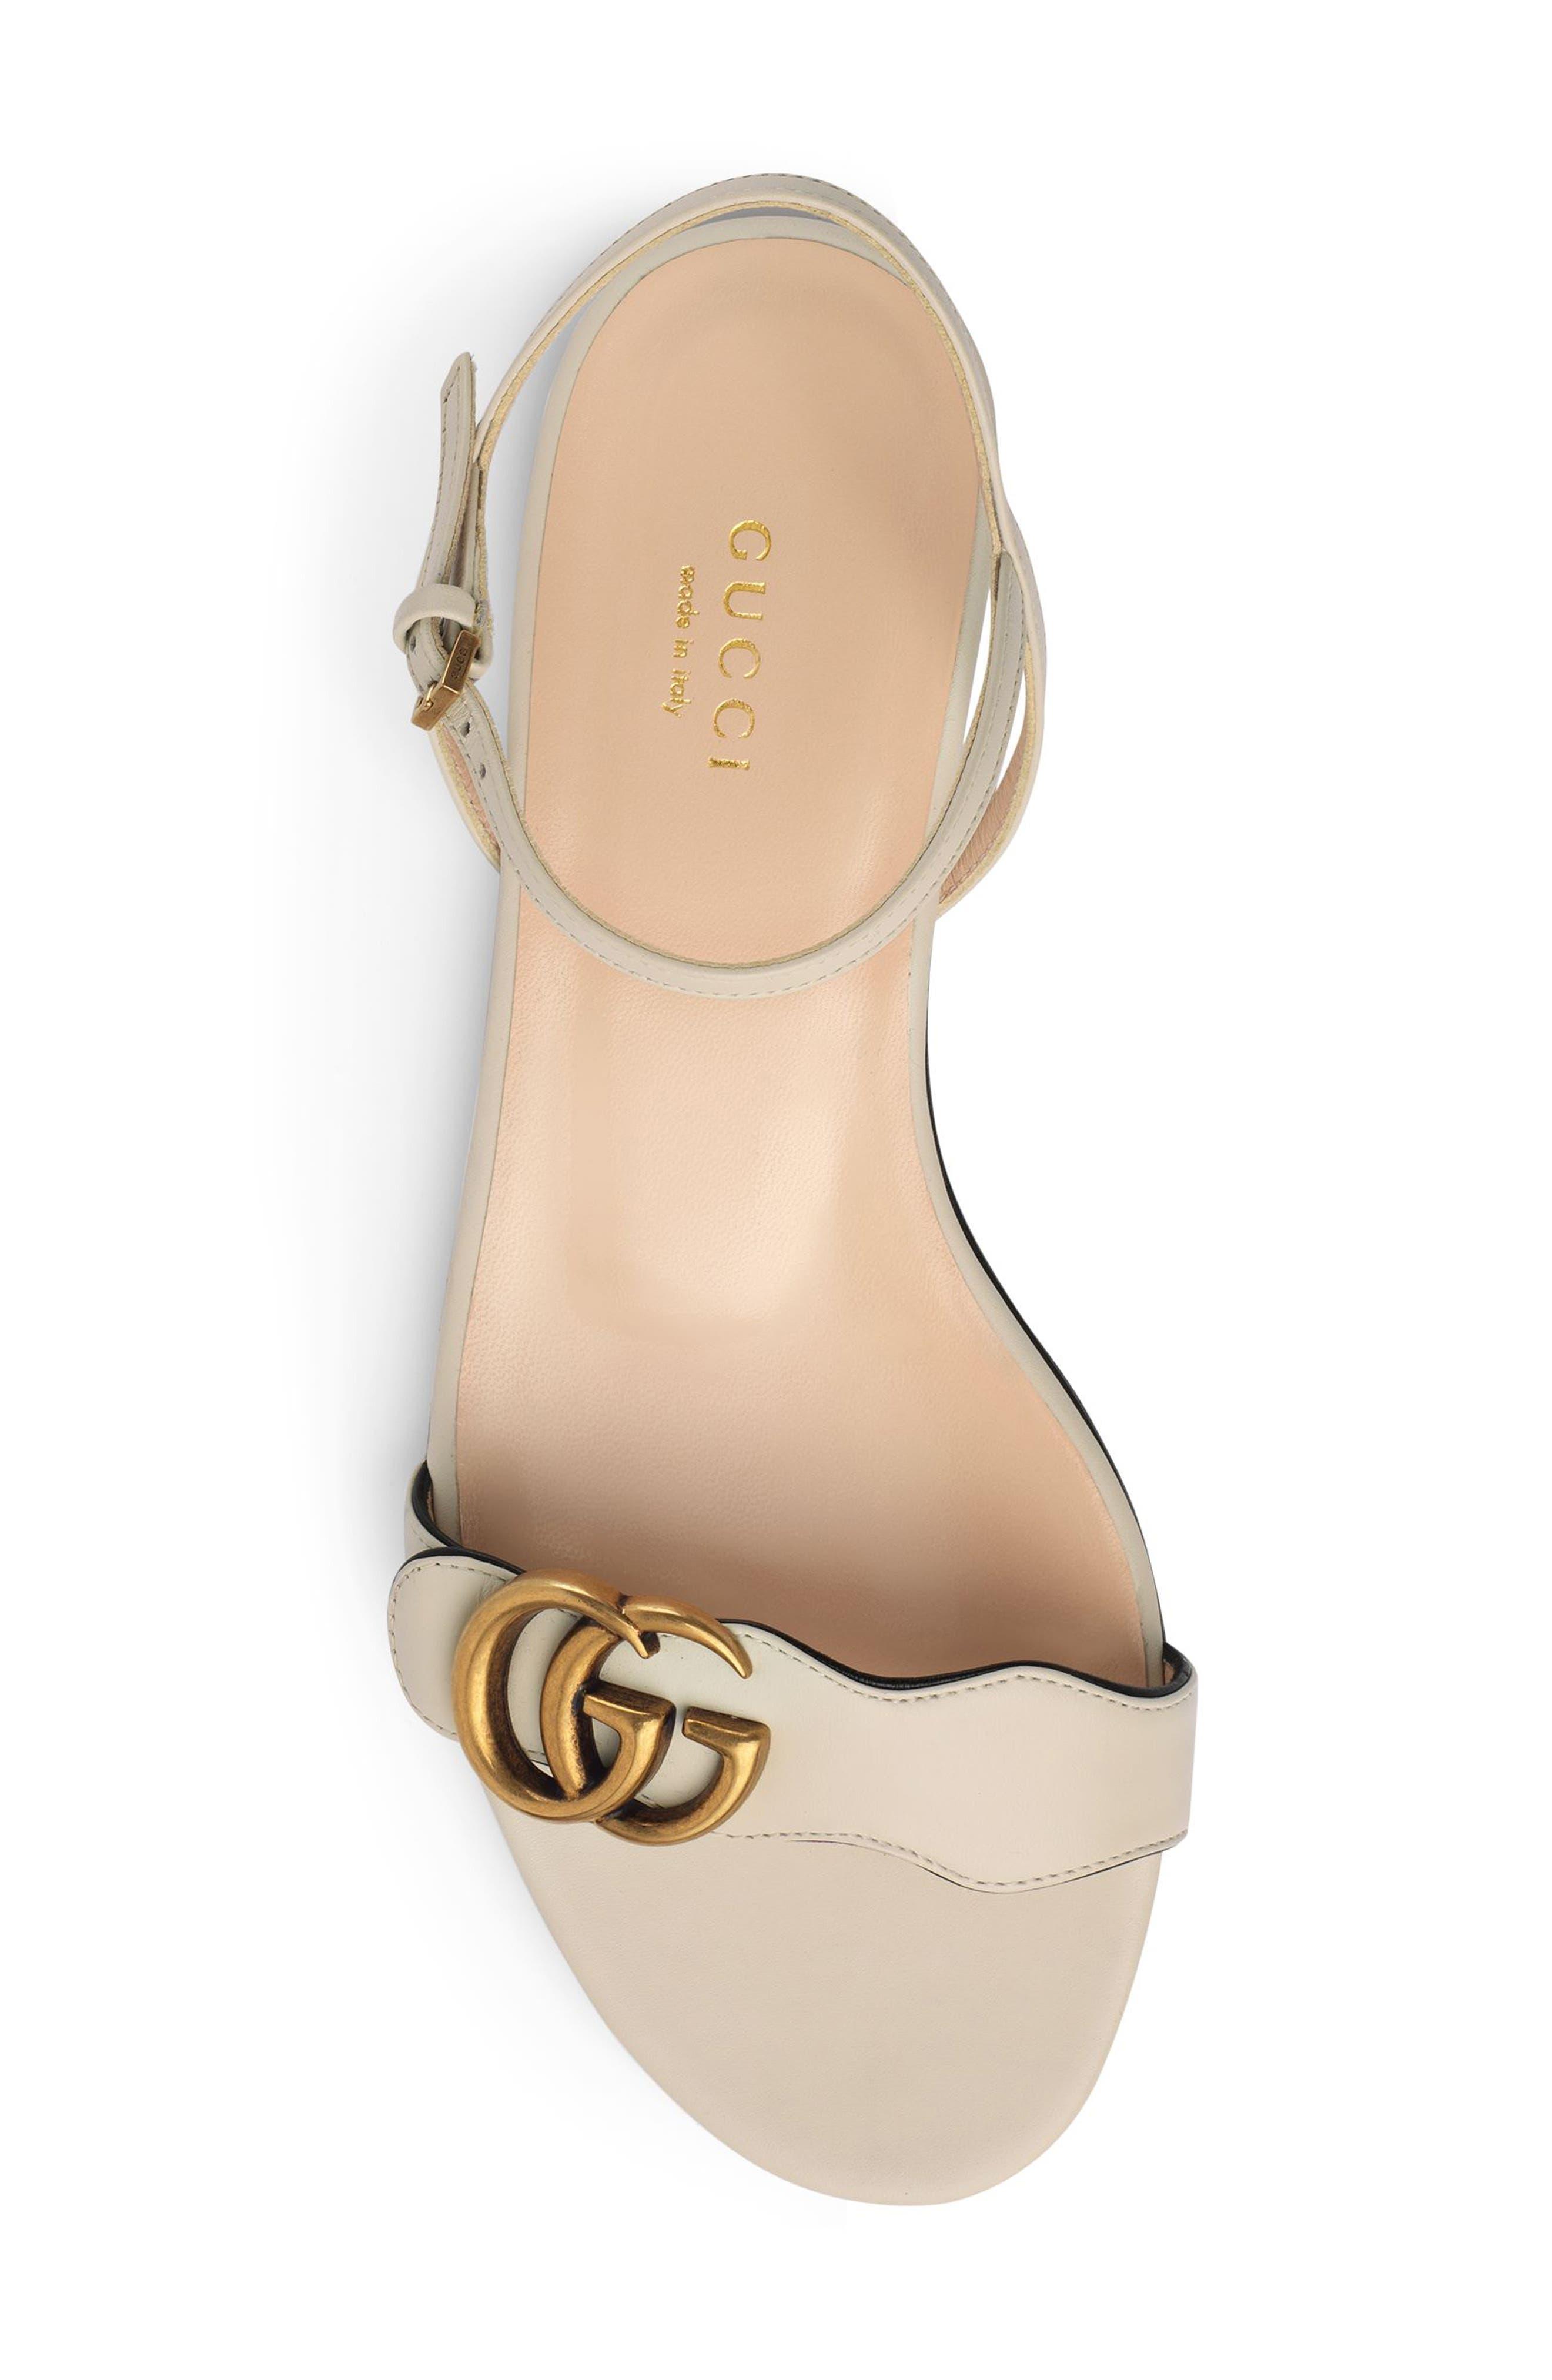 GUCCI, Marmont Quarter Strap Flat Sandal, Alternate thumbnail 4, color, MYSTIC WHITE